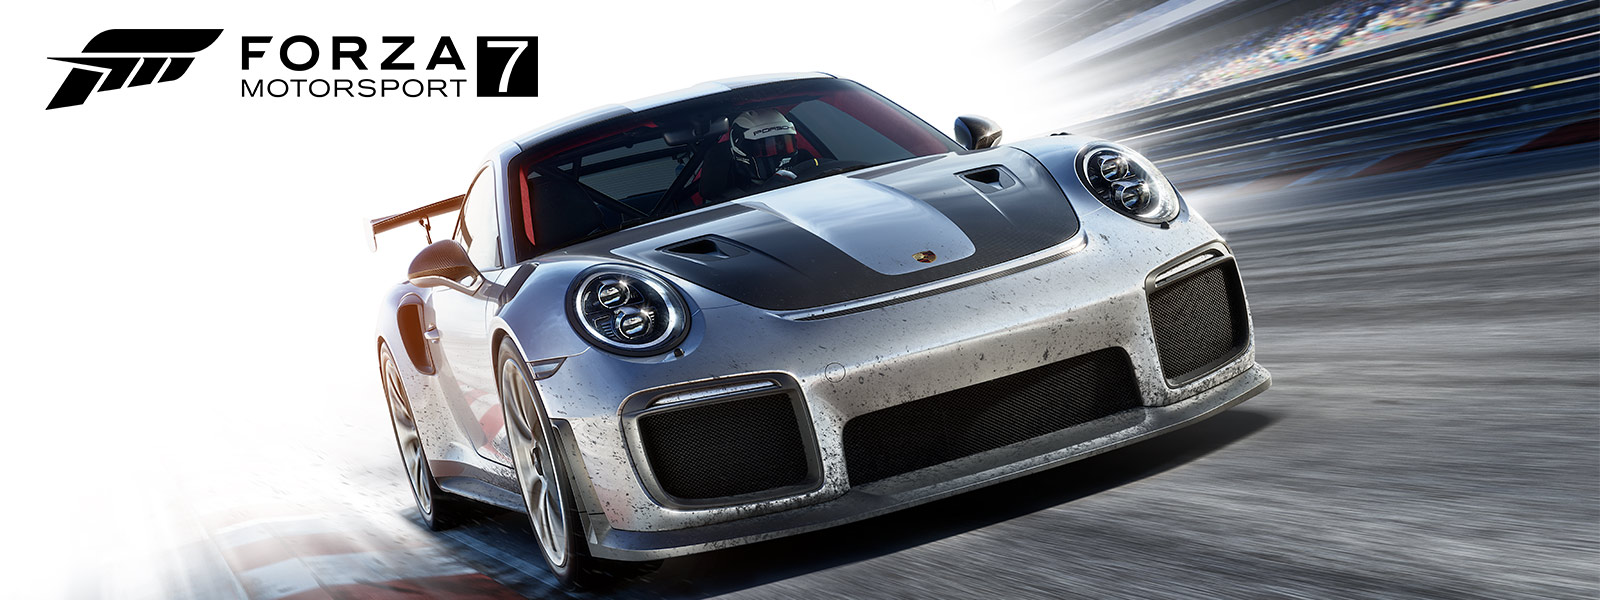 Forza Motorsport 7-skærm